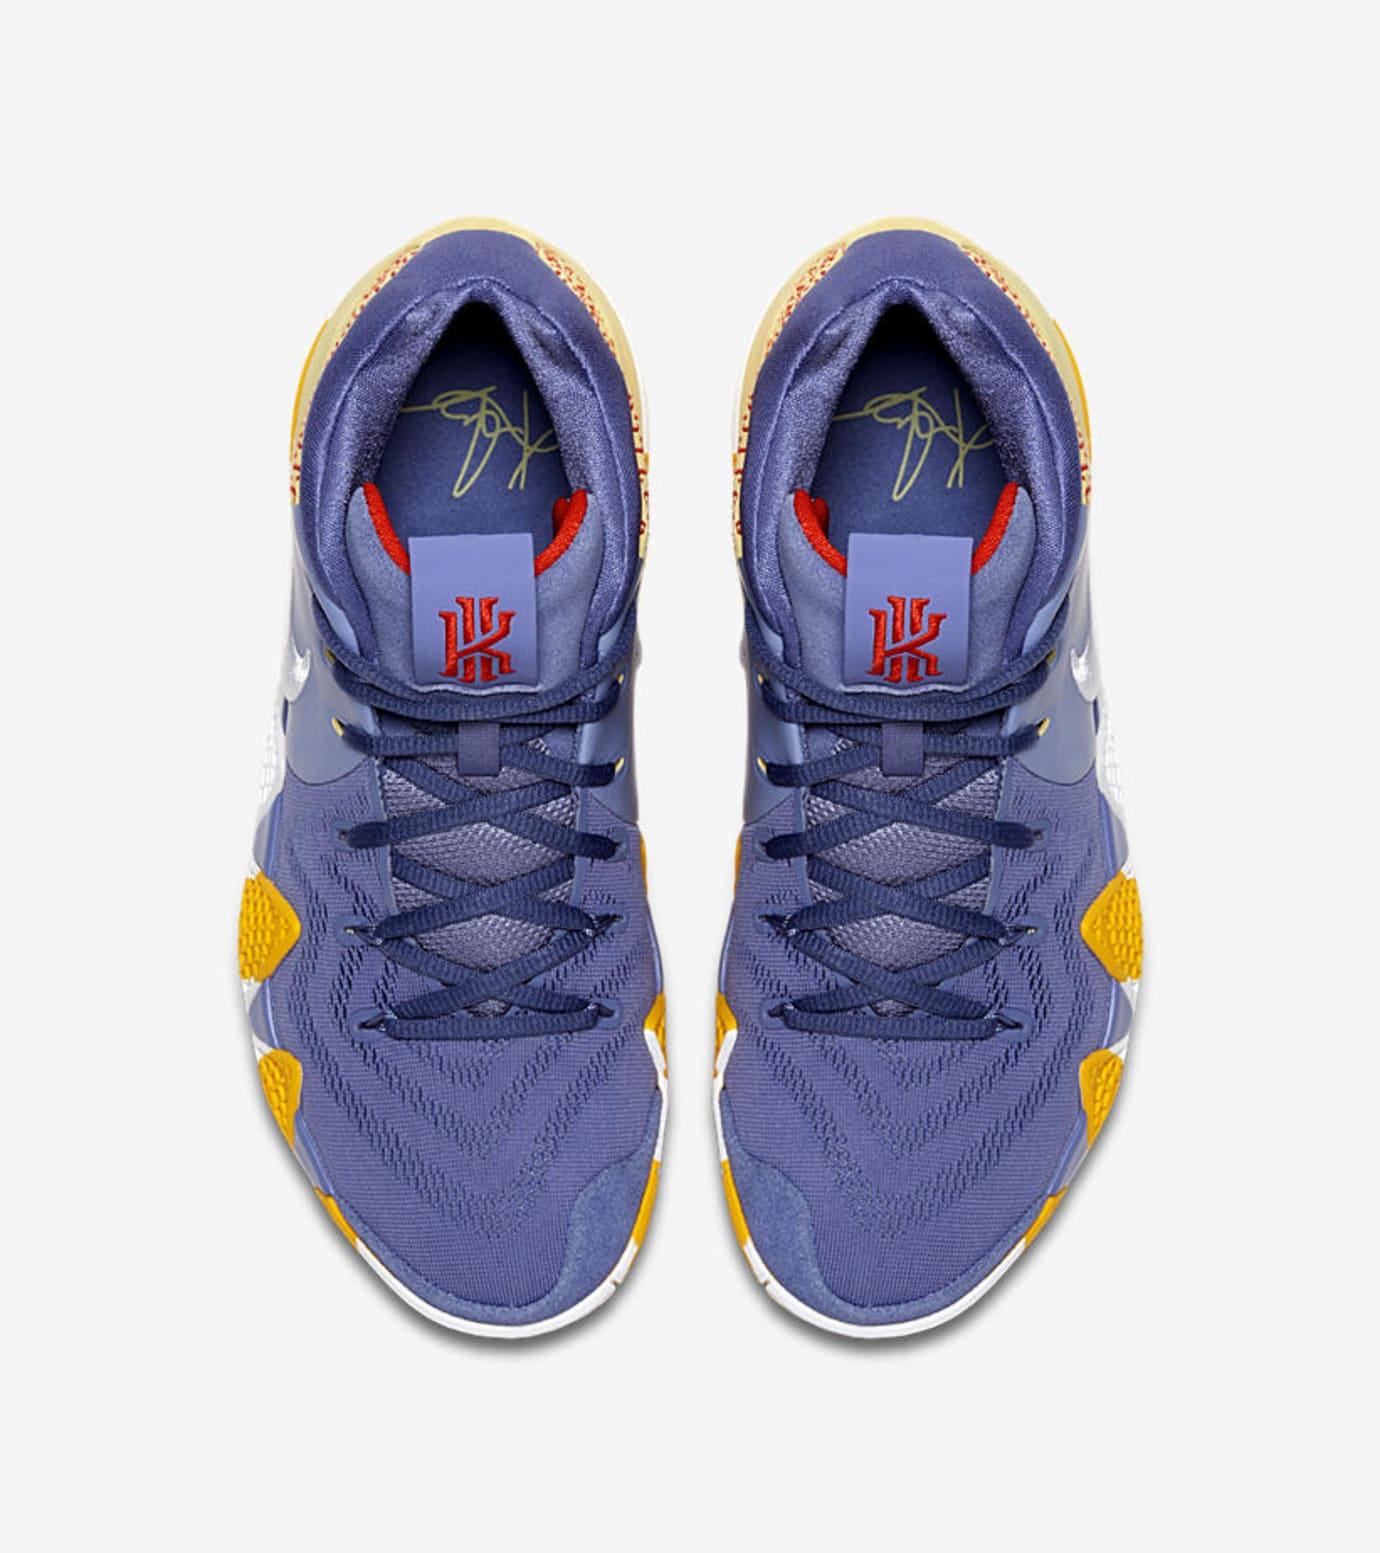 56683abab4b2 Image via Nike Nike Kyrie 4  London PE  AR6189-500 (Top)